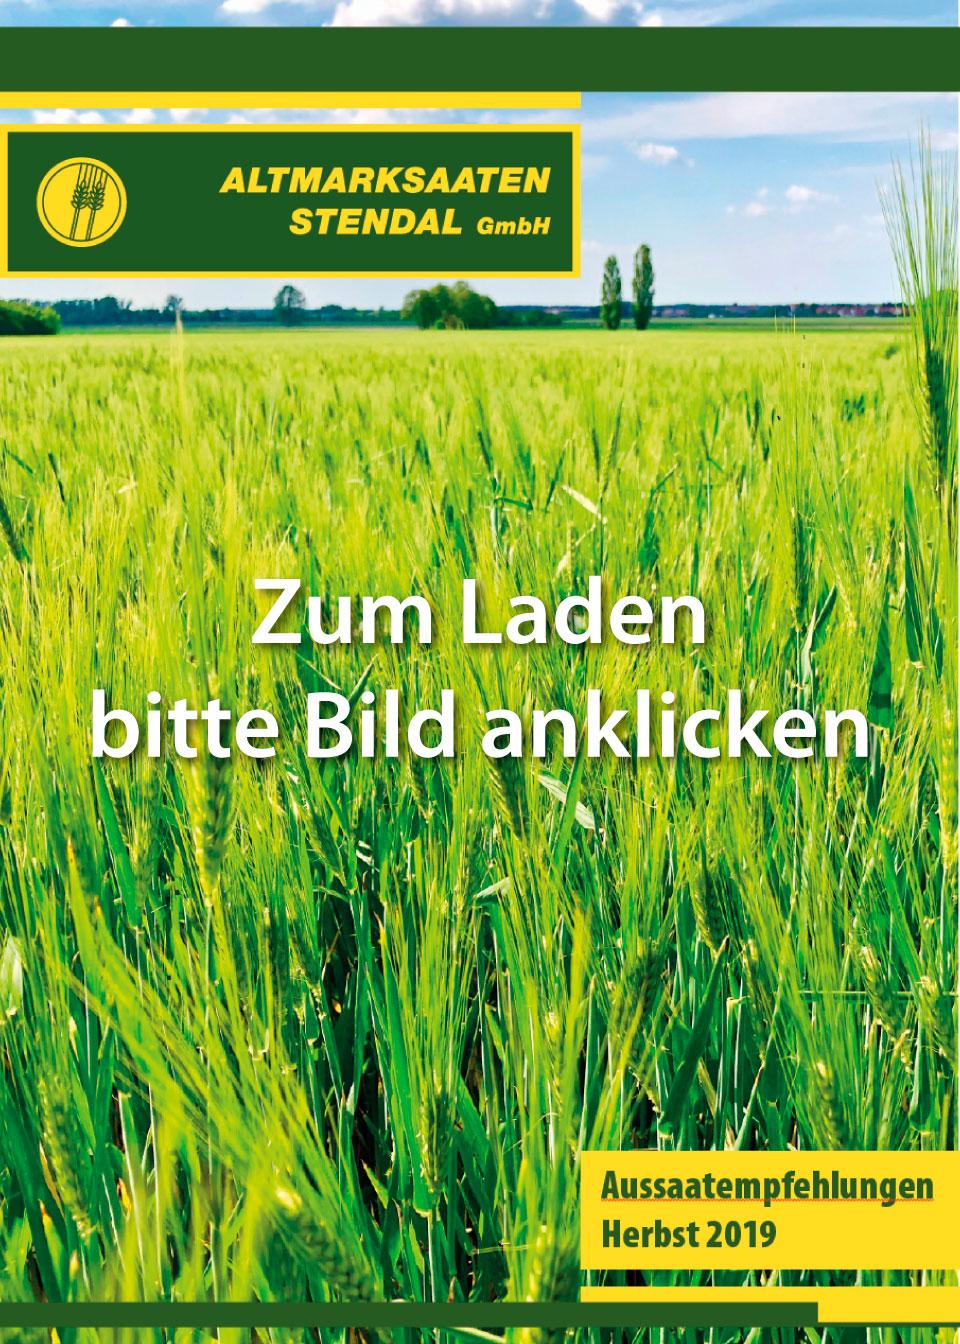 Download 2019 Herbst Katalog Aussaatempfehlungen, Altmarksaaten